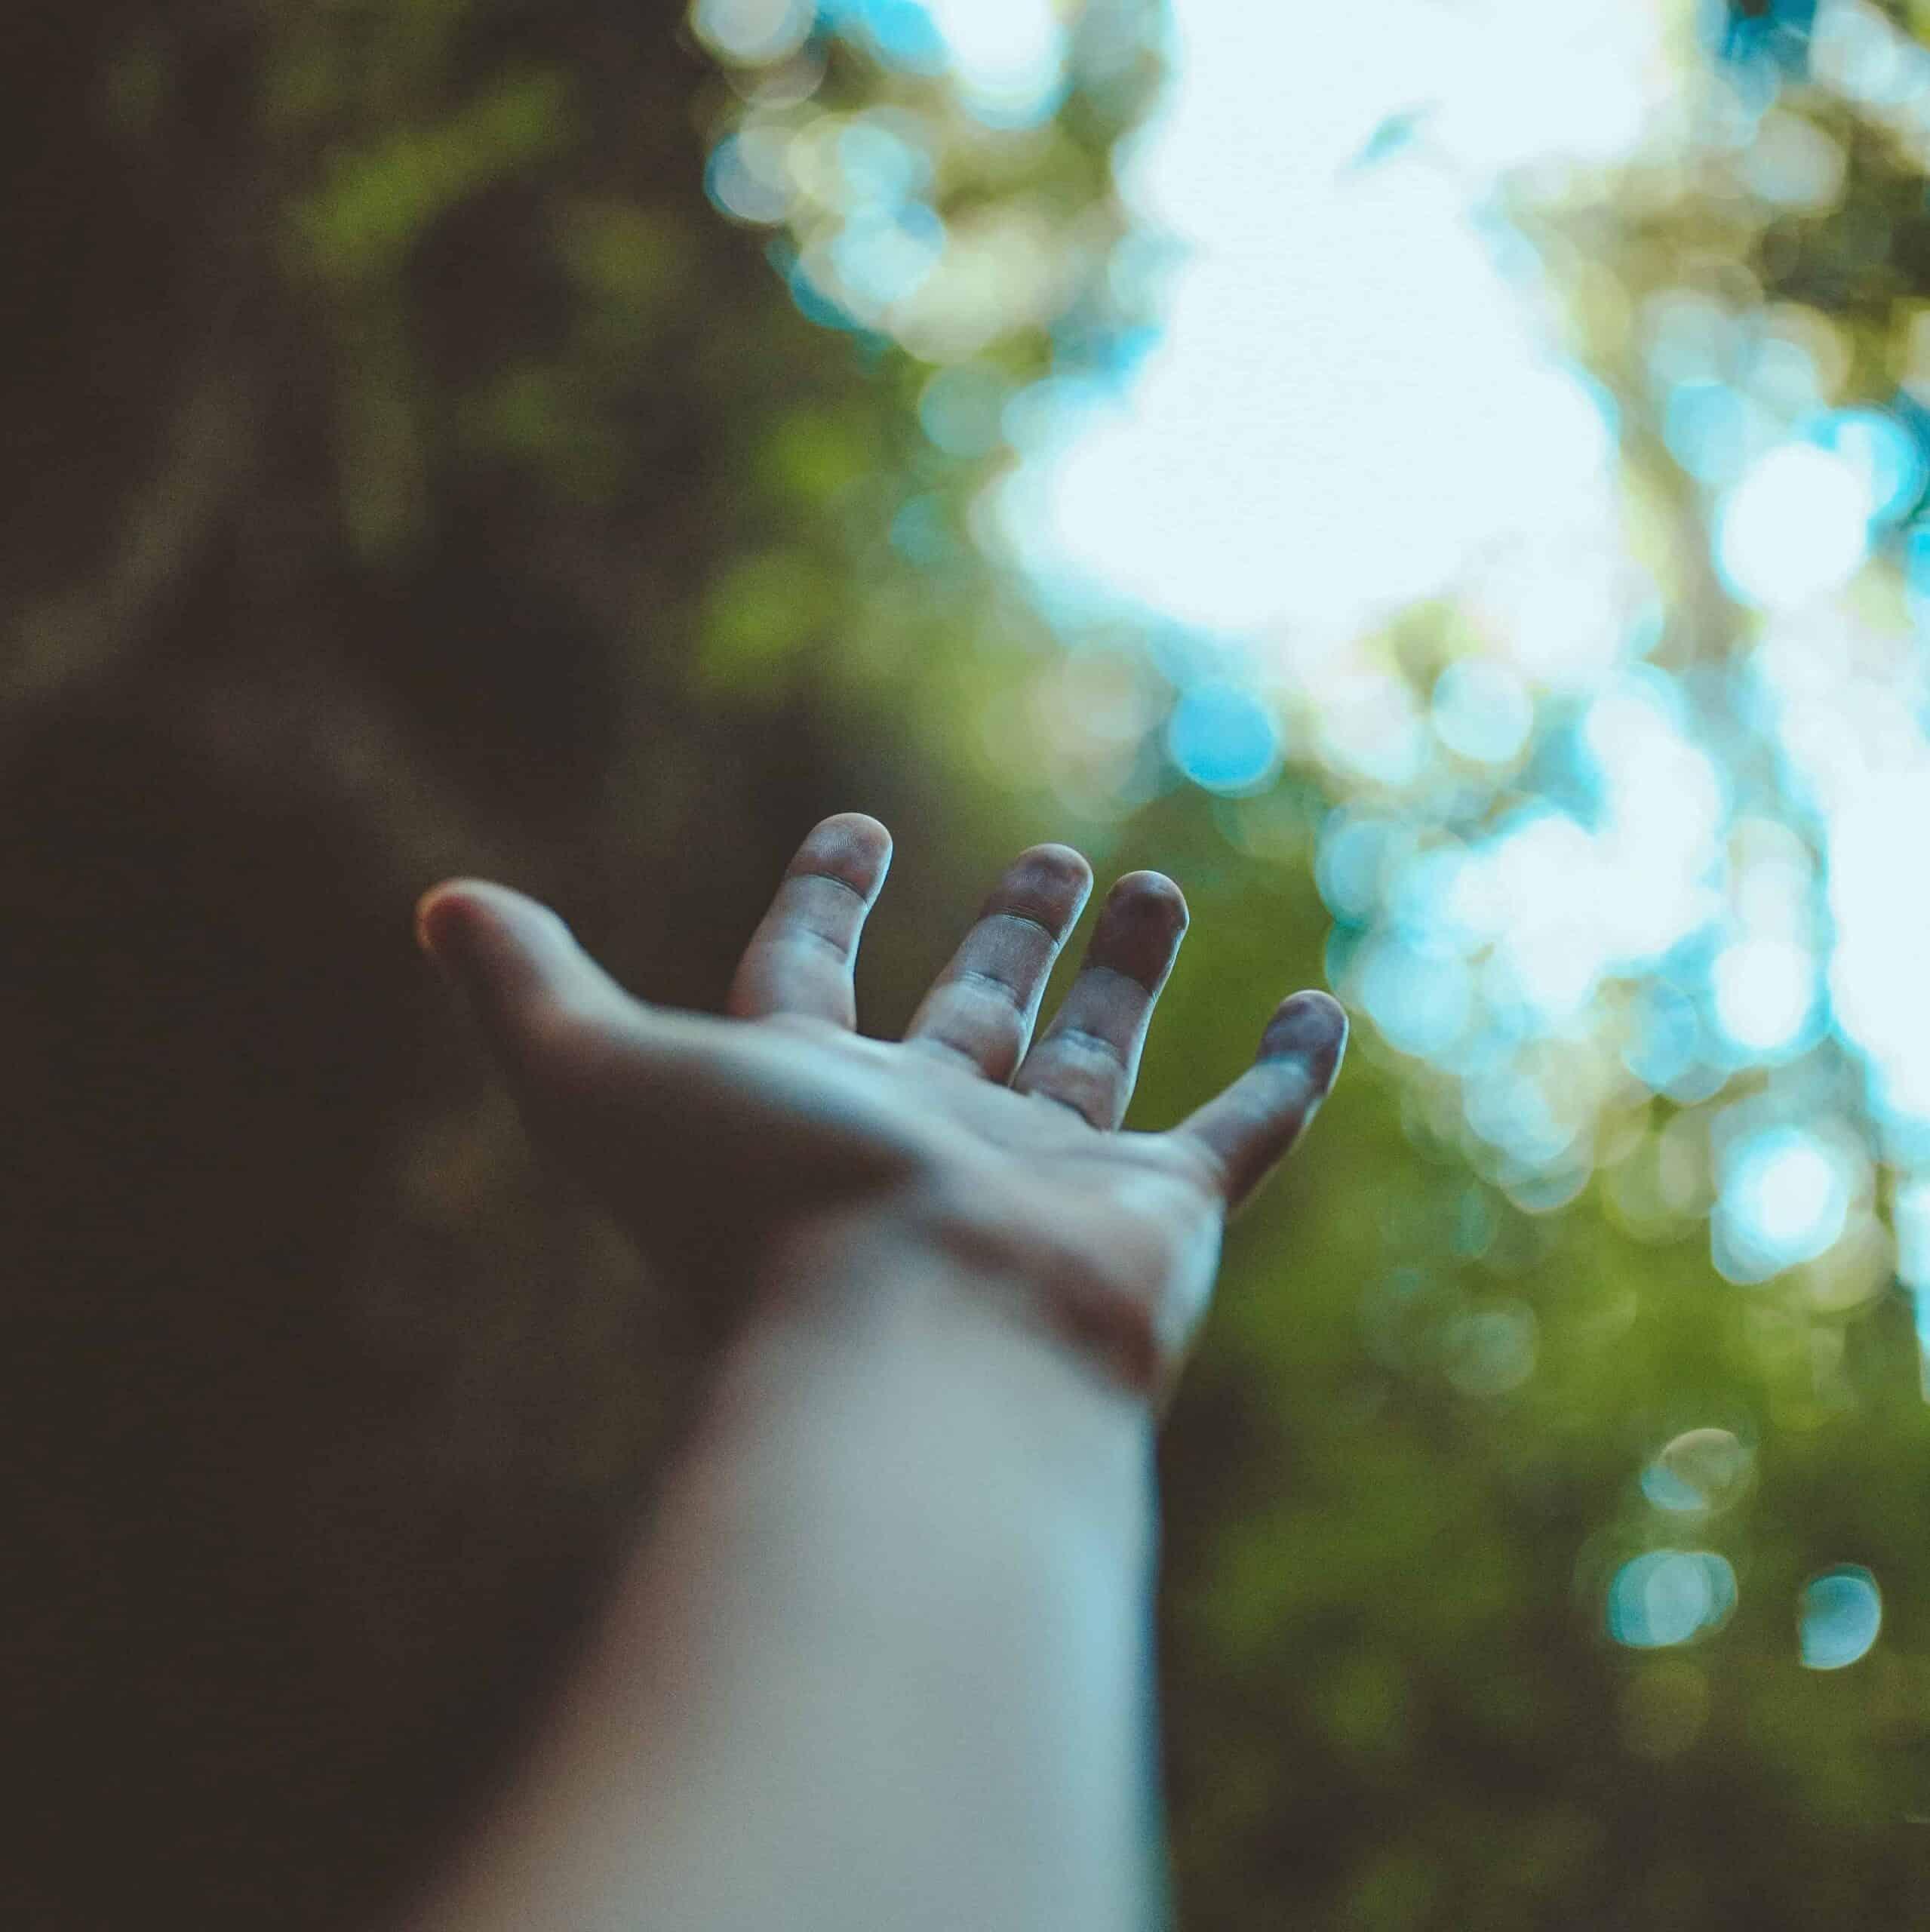 A hand reaching towards the sky.